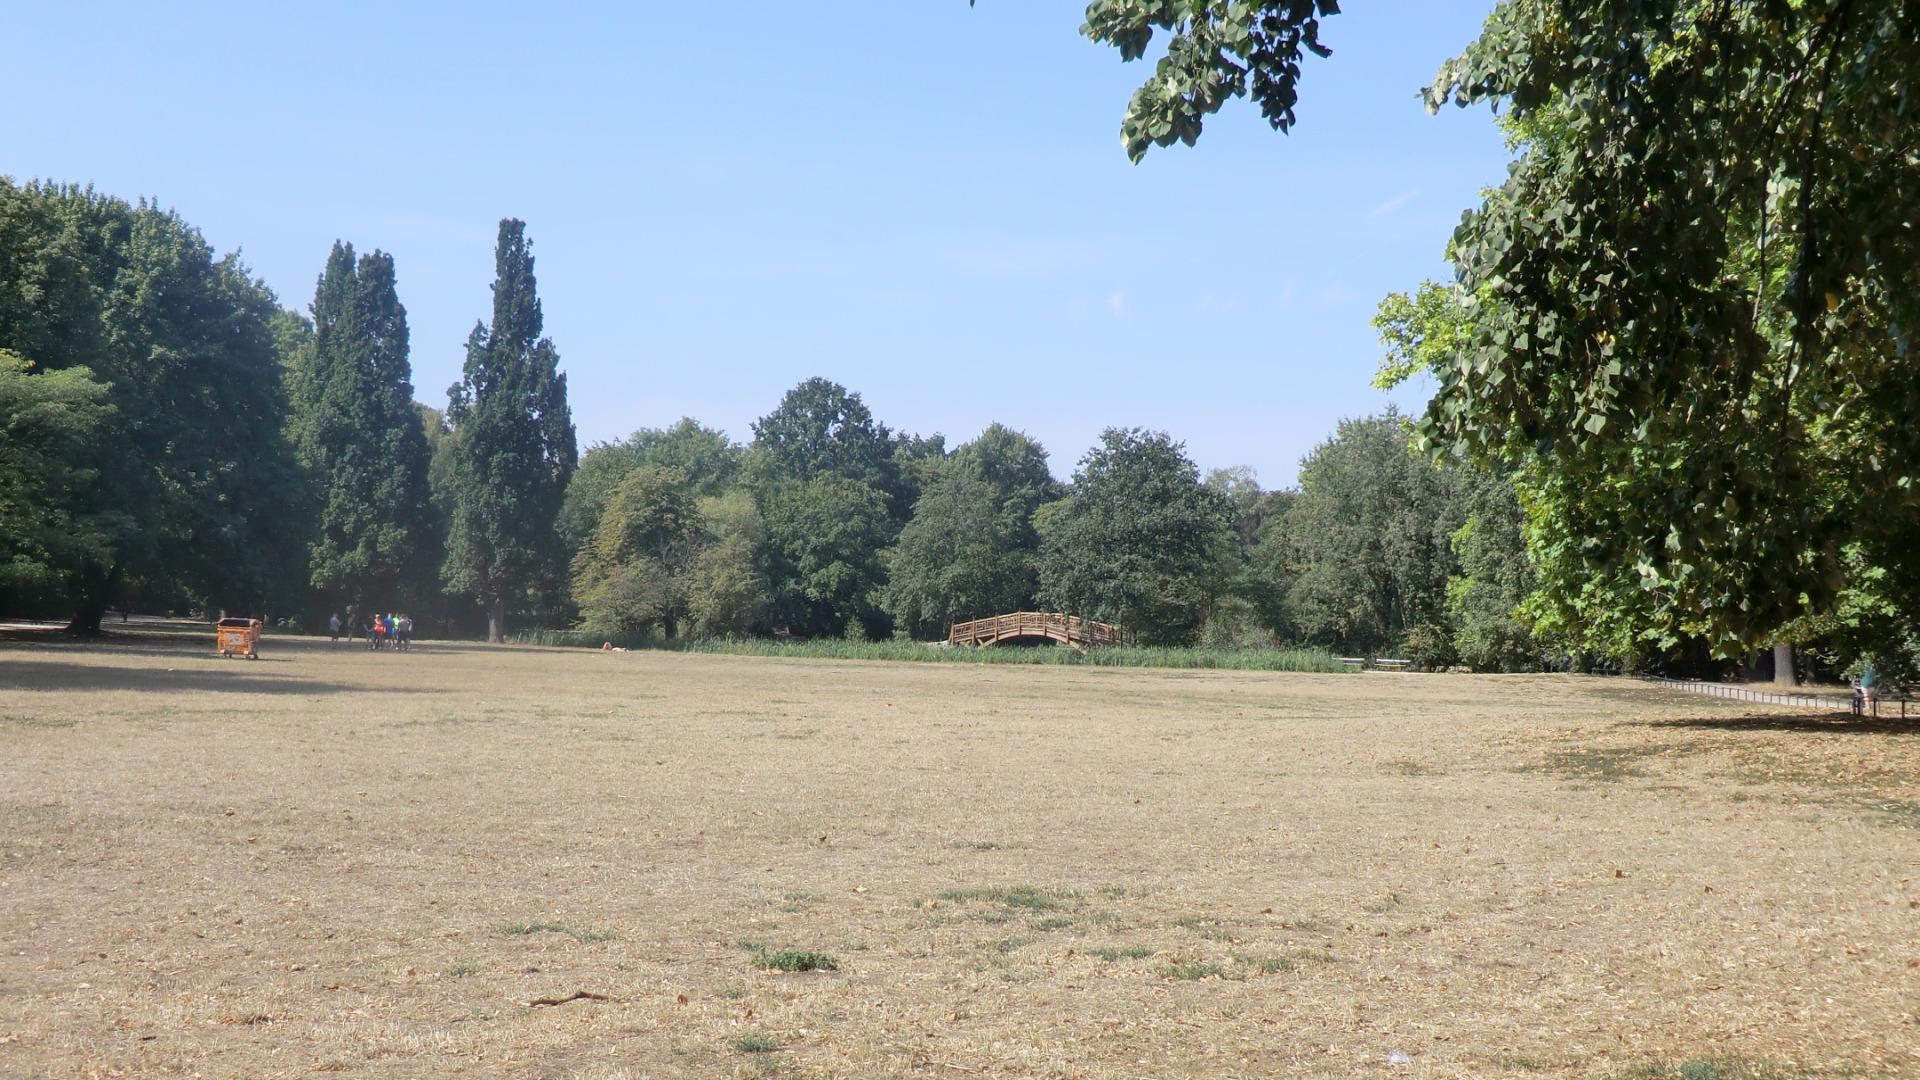 Leipziger Stadtpark